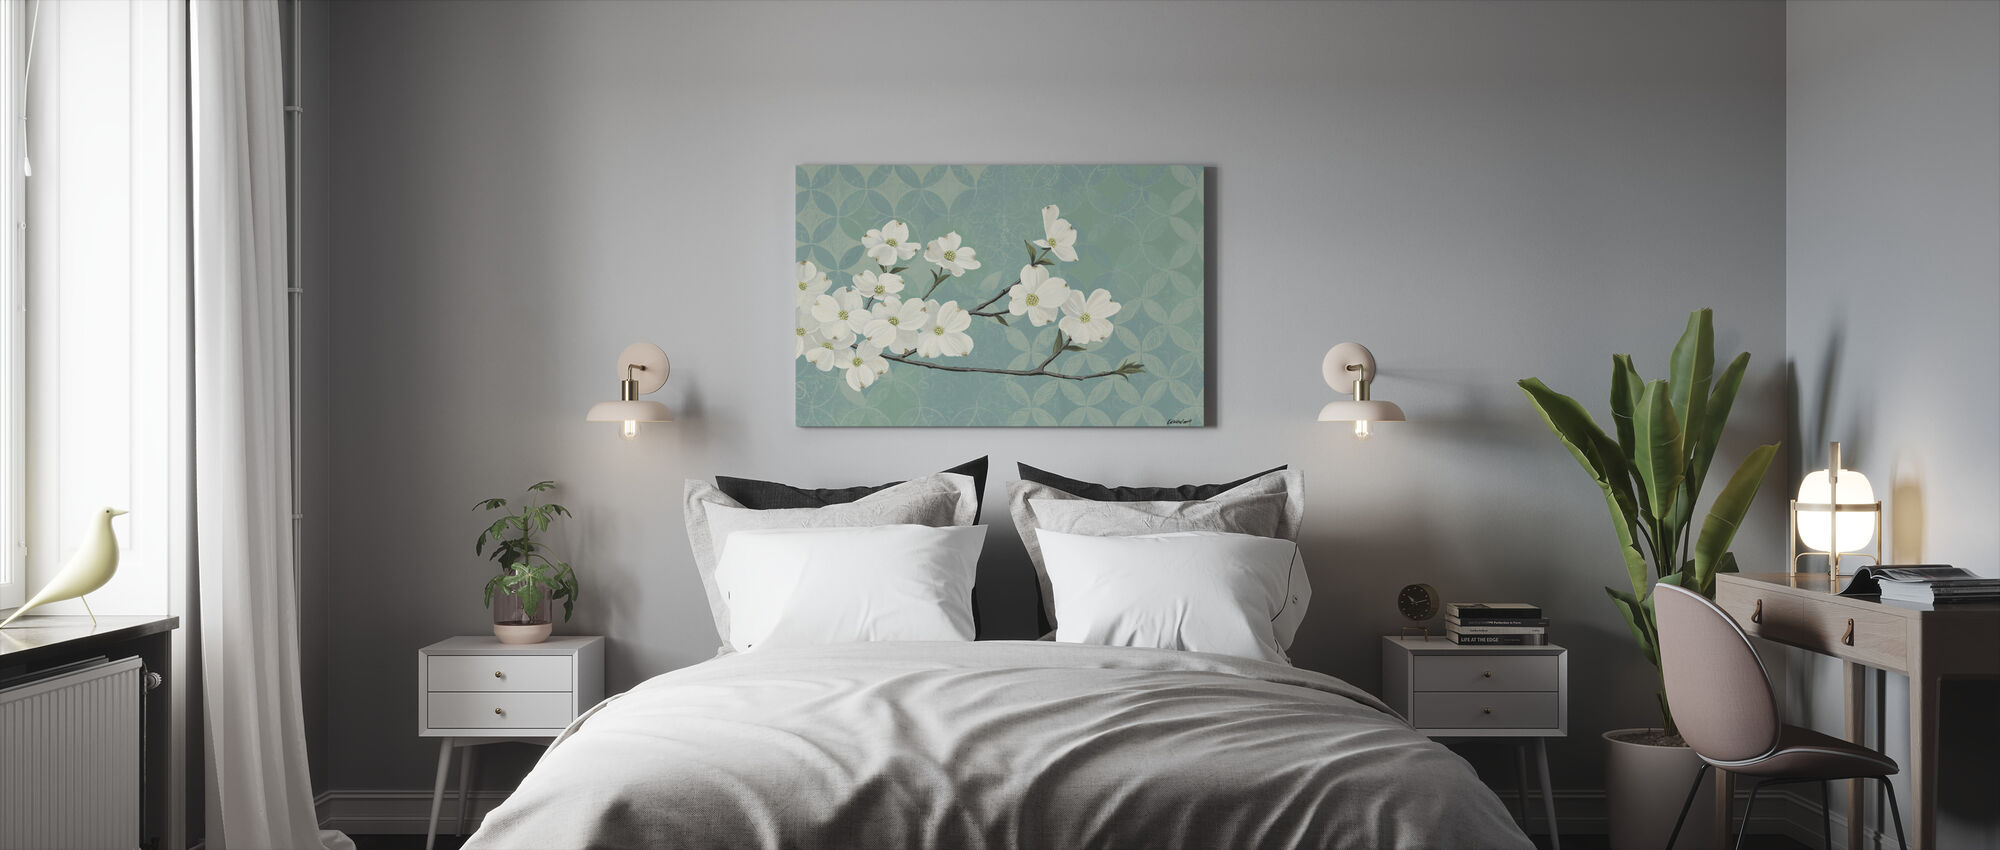 Dogwood Blossoms - Canvas print - Bedroom